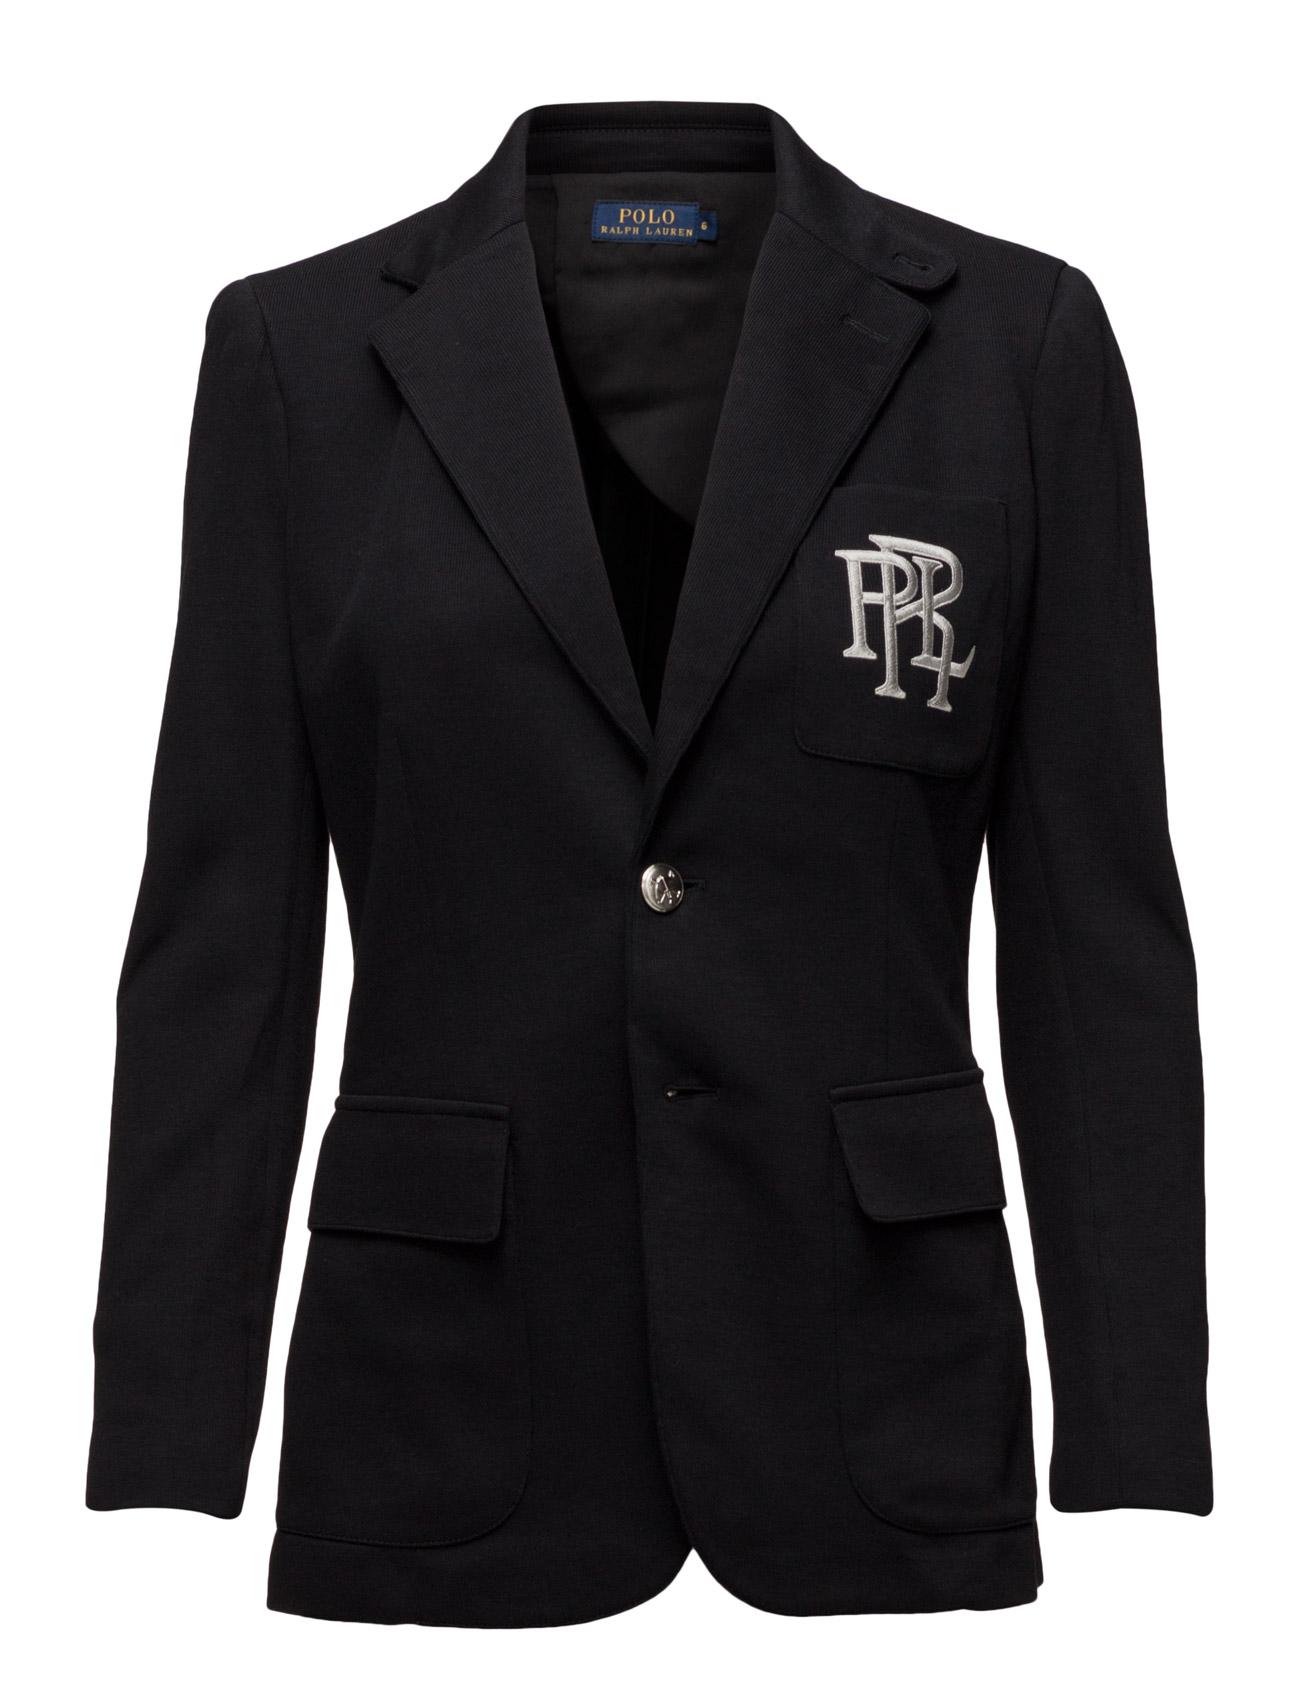 da89ffa046ff31 Knit Cotton Blazer (Polo Black) (£249) - Polo Ralph Lauren -